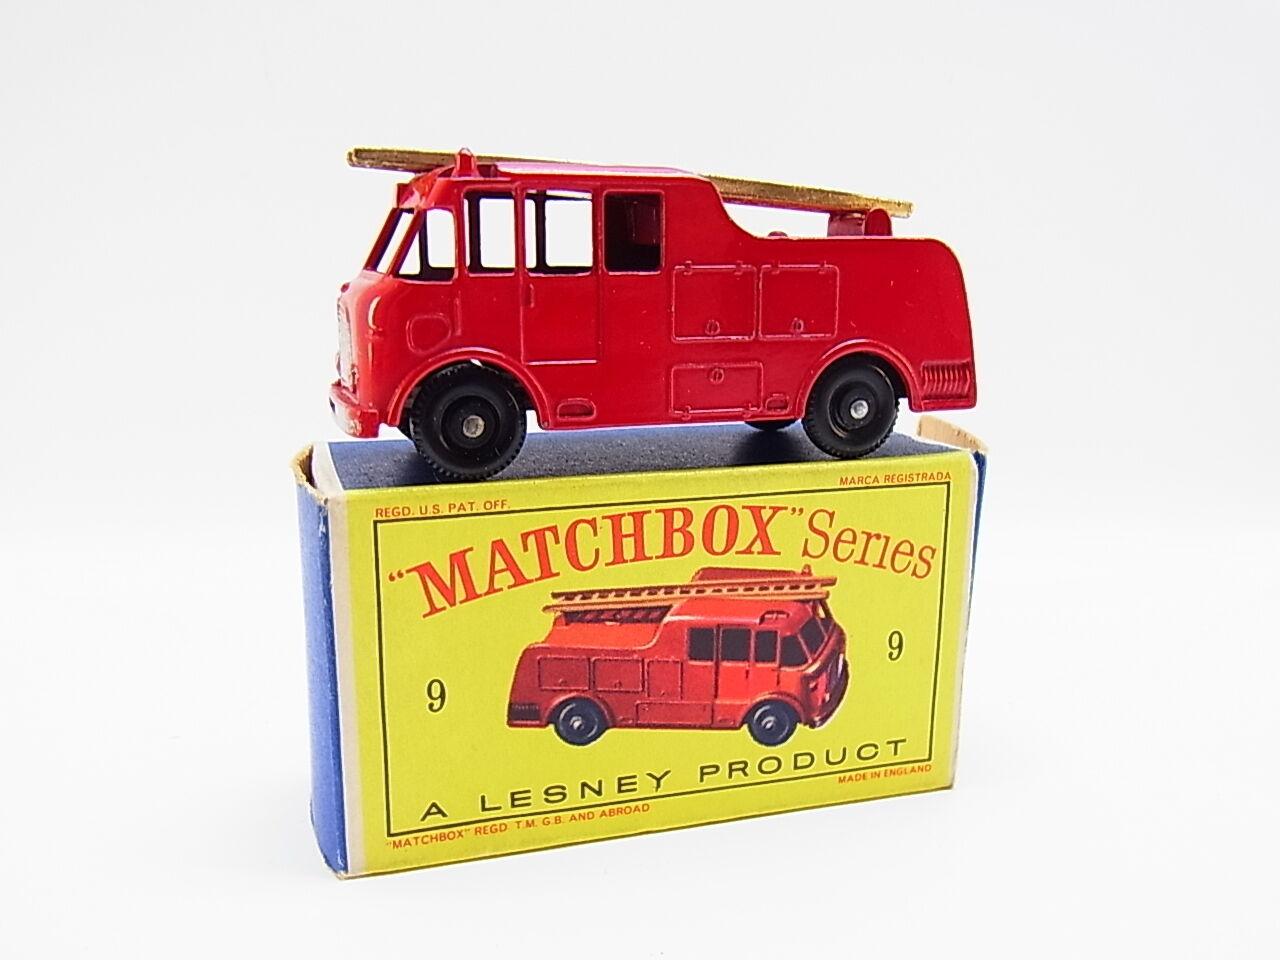 Lot 33344   MATCHBOX 9 C Merryweather  Ser. III FIRE ENGINE CAMION NEUF  D  - Box  vente en ligne